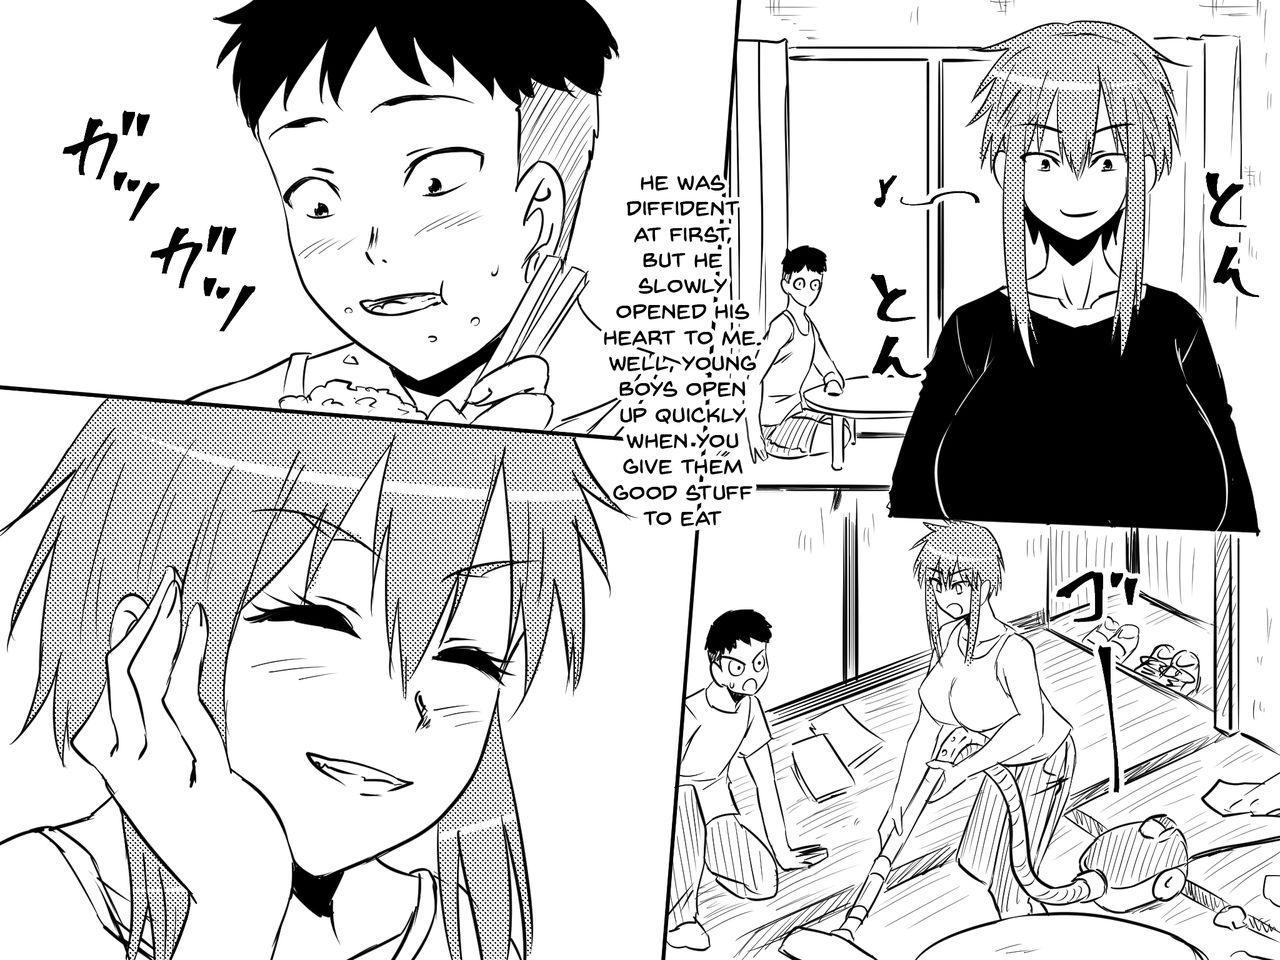 [Mikezoutei] Netorare Haha ~Kachiki de Kimottama no Okaa-san ga Boku o Ijimeru Aitsu no Onna ni Naru Hanashi~   Mom NTR ~A Story Of How My Gutsy Mom Ended Up Becoming My Bully's Plaything~ [English] {Doujins.com} 38